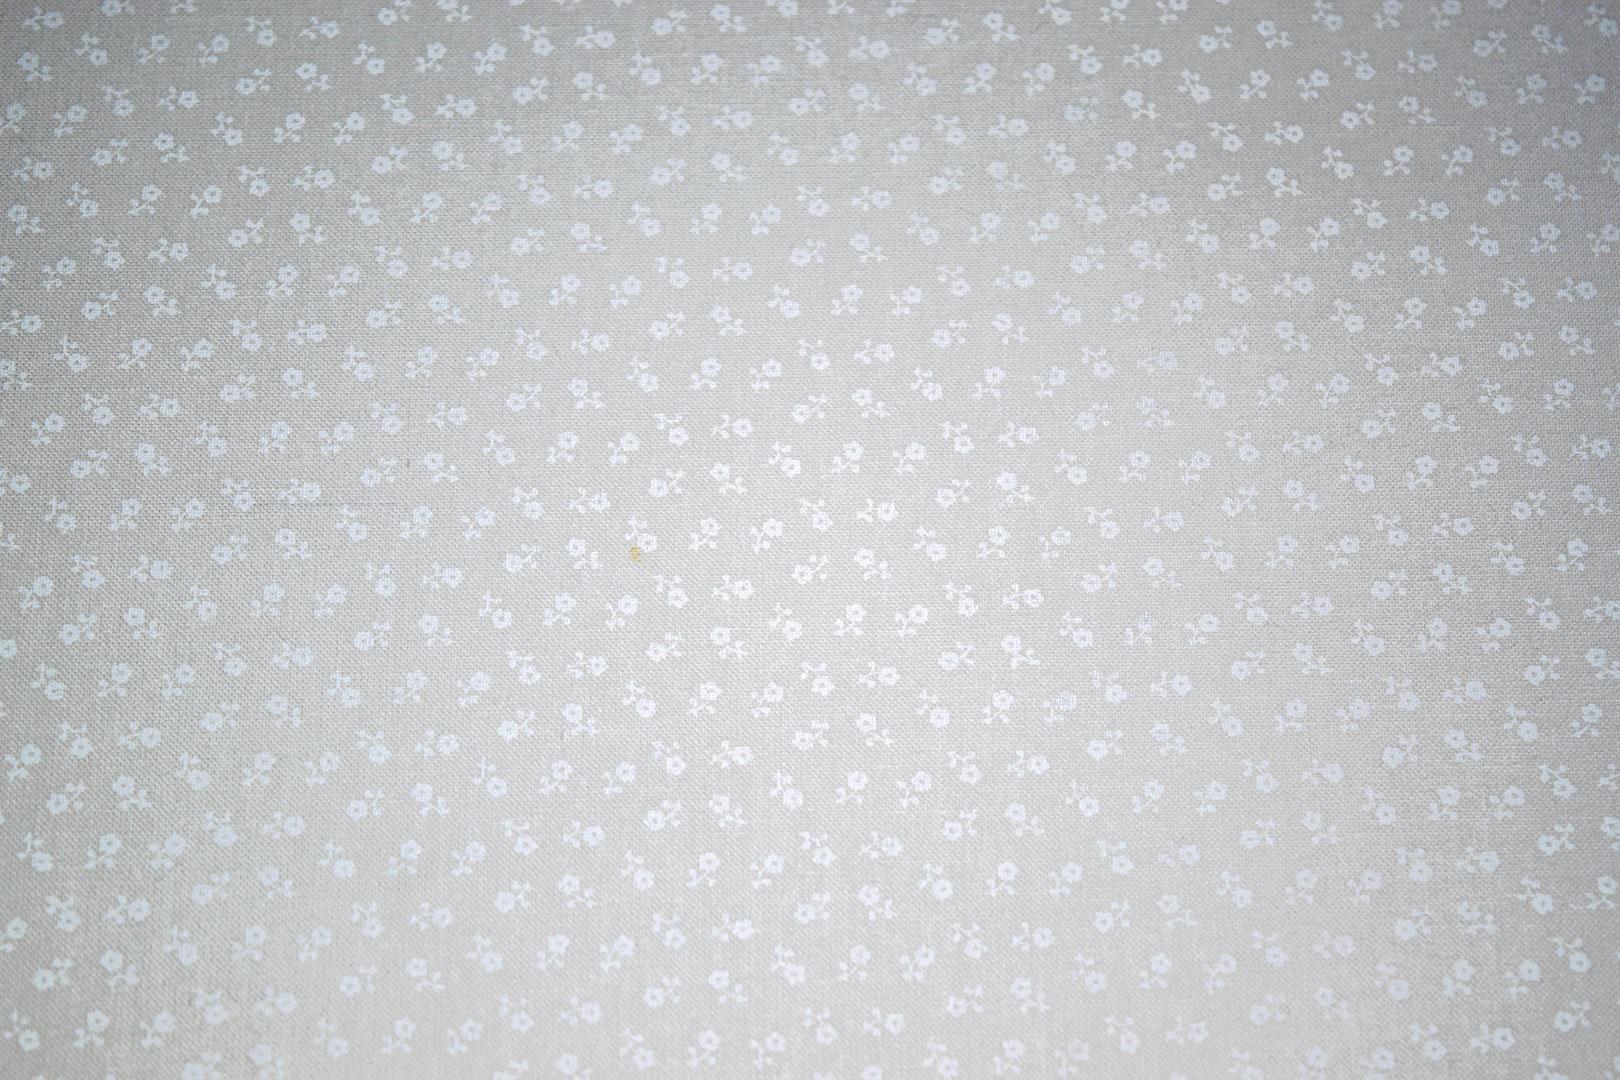 "8_19616_ww   44/45"" 68/68, 100% Carded Cotton"